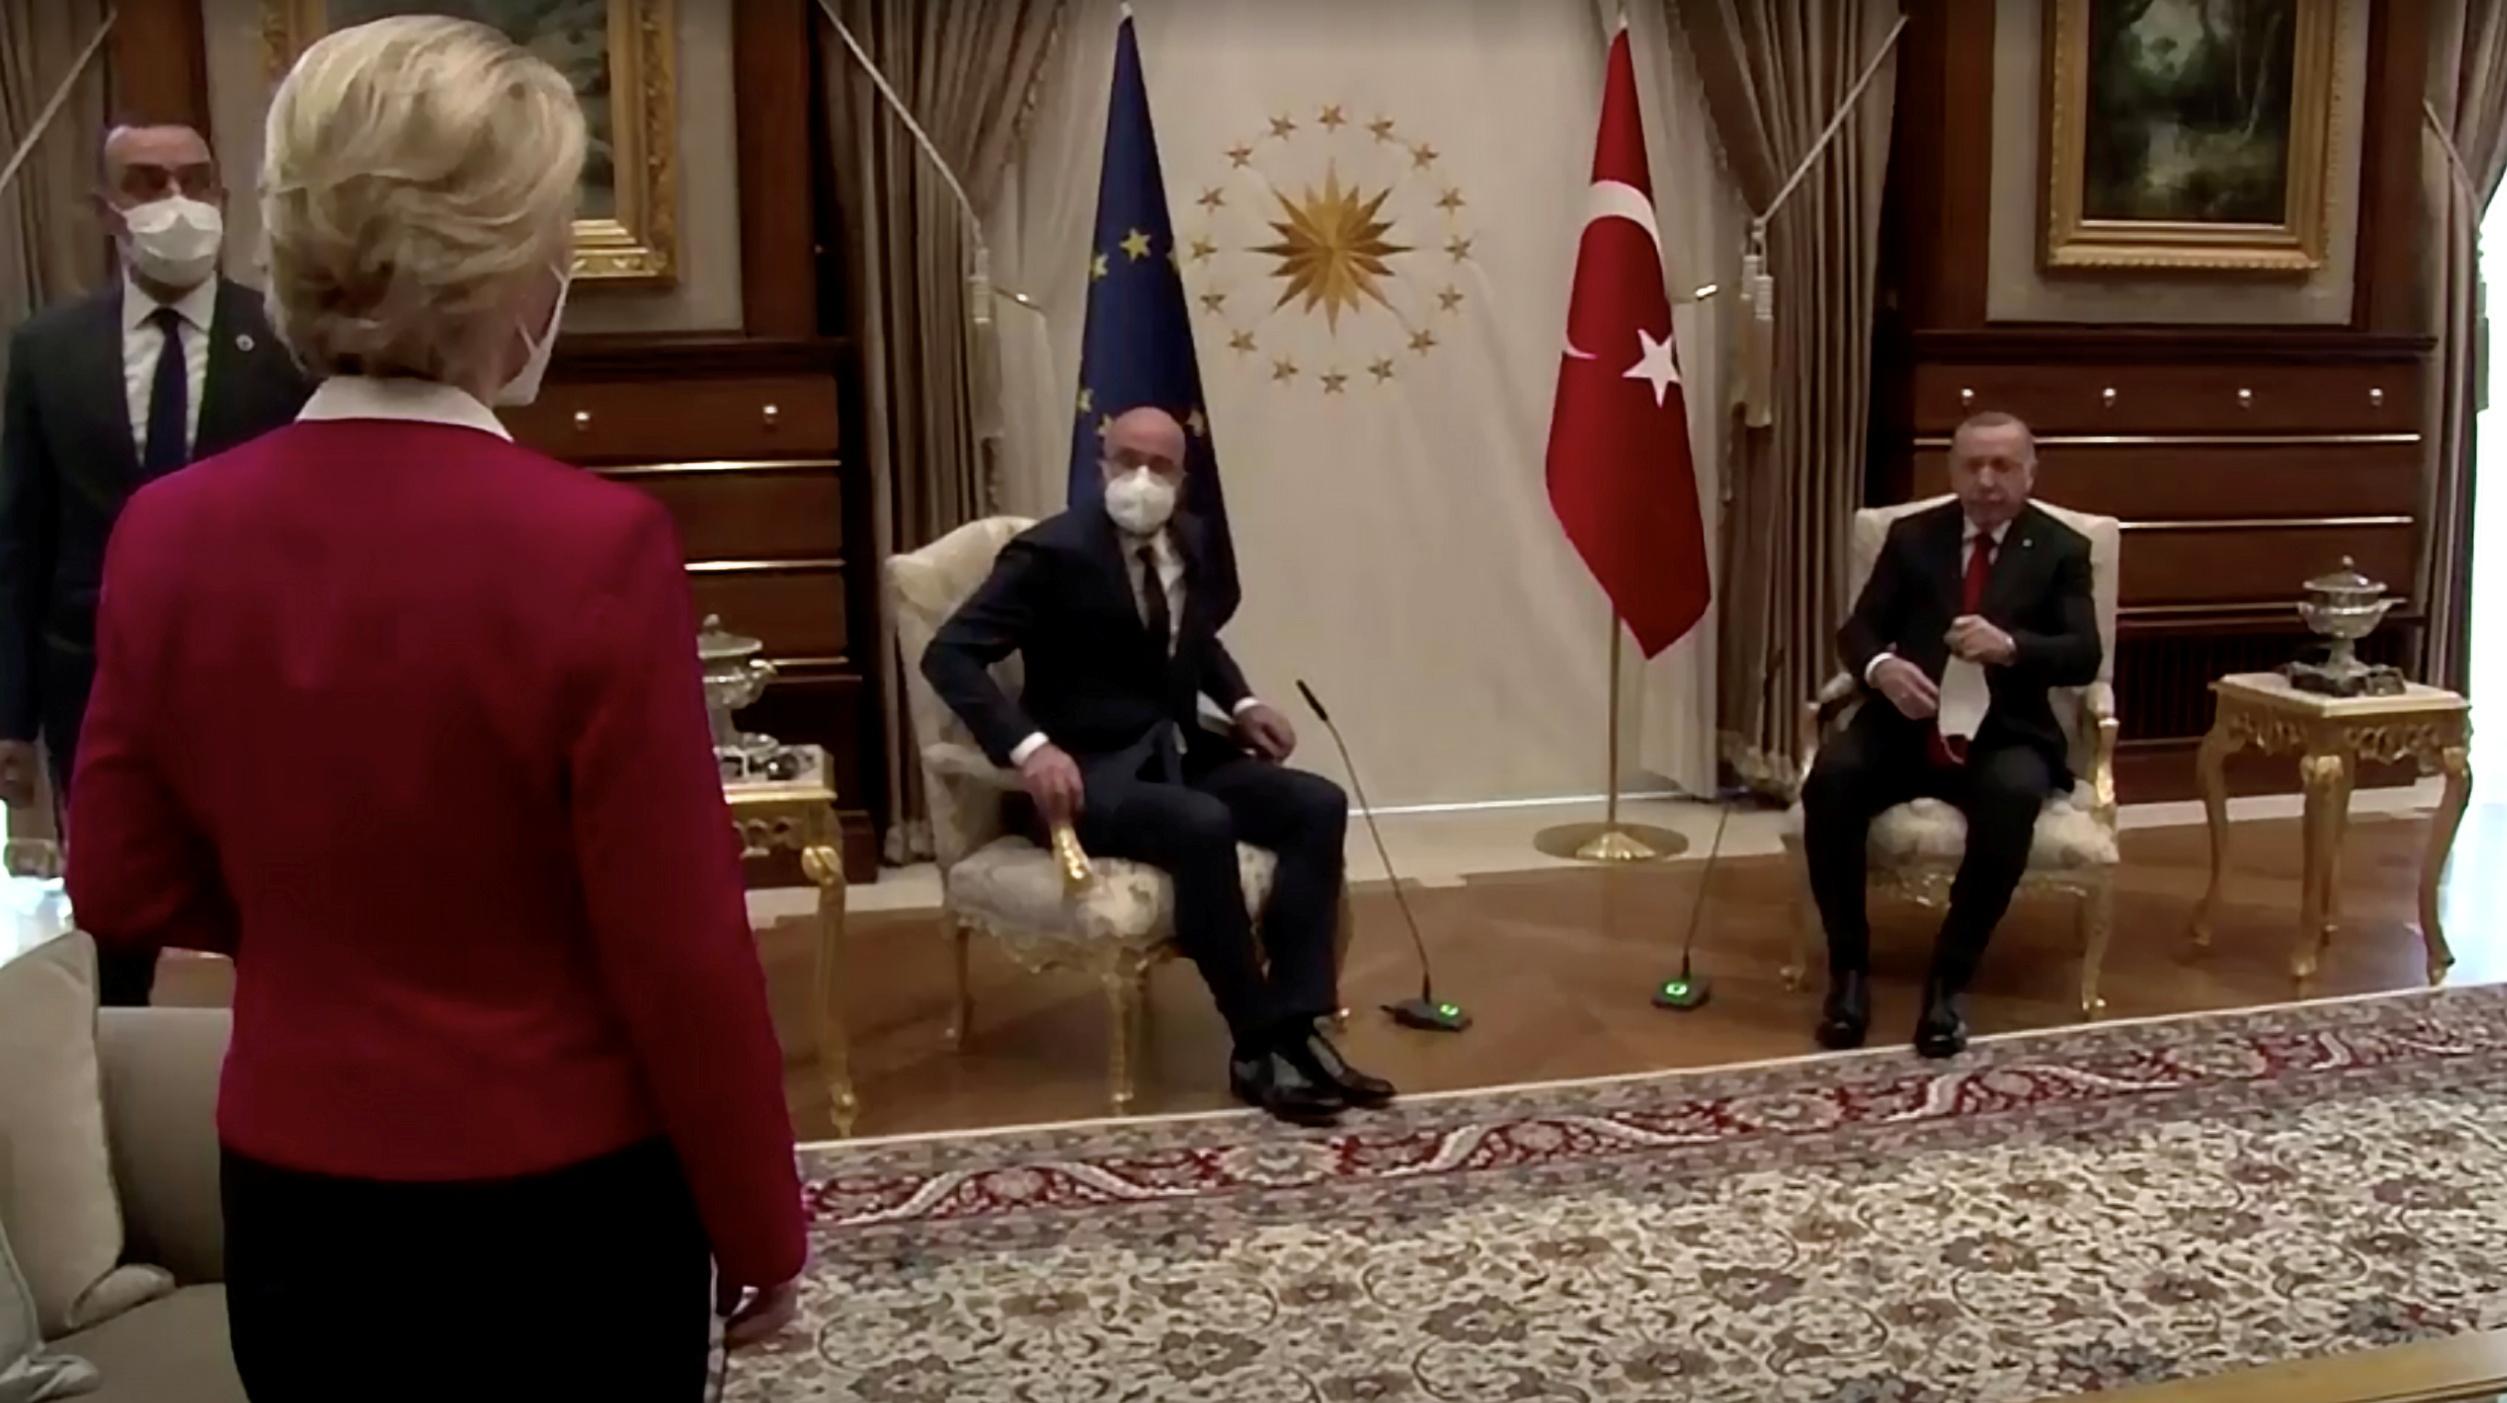 Sofagate: Πως μια πολυθρόνα προκάλεσε διπλωματικό πόλεμο Ιταλίας – Τουρκίας